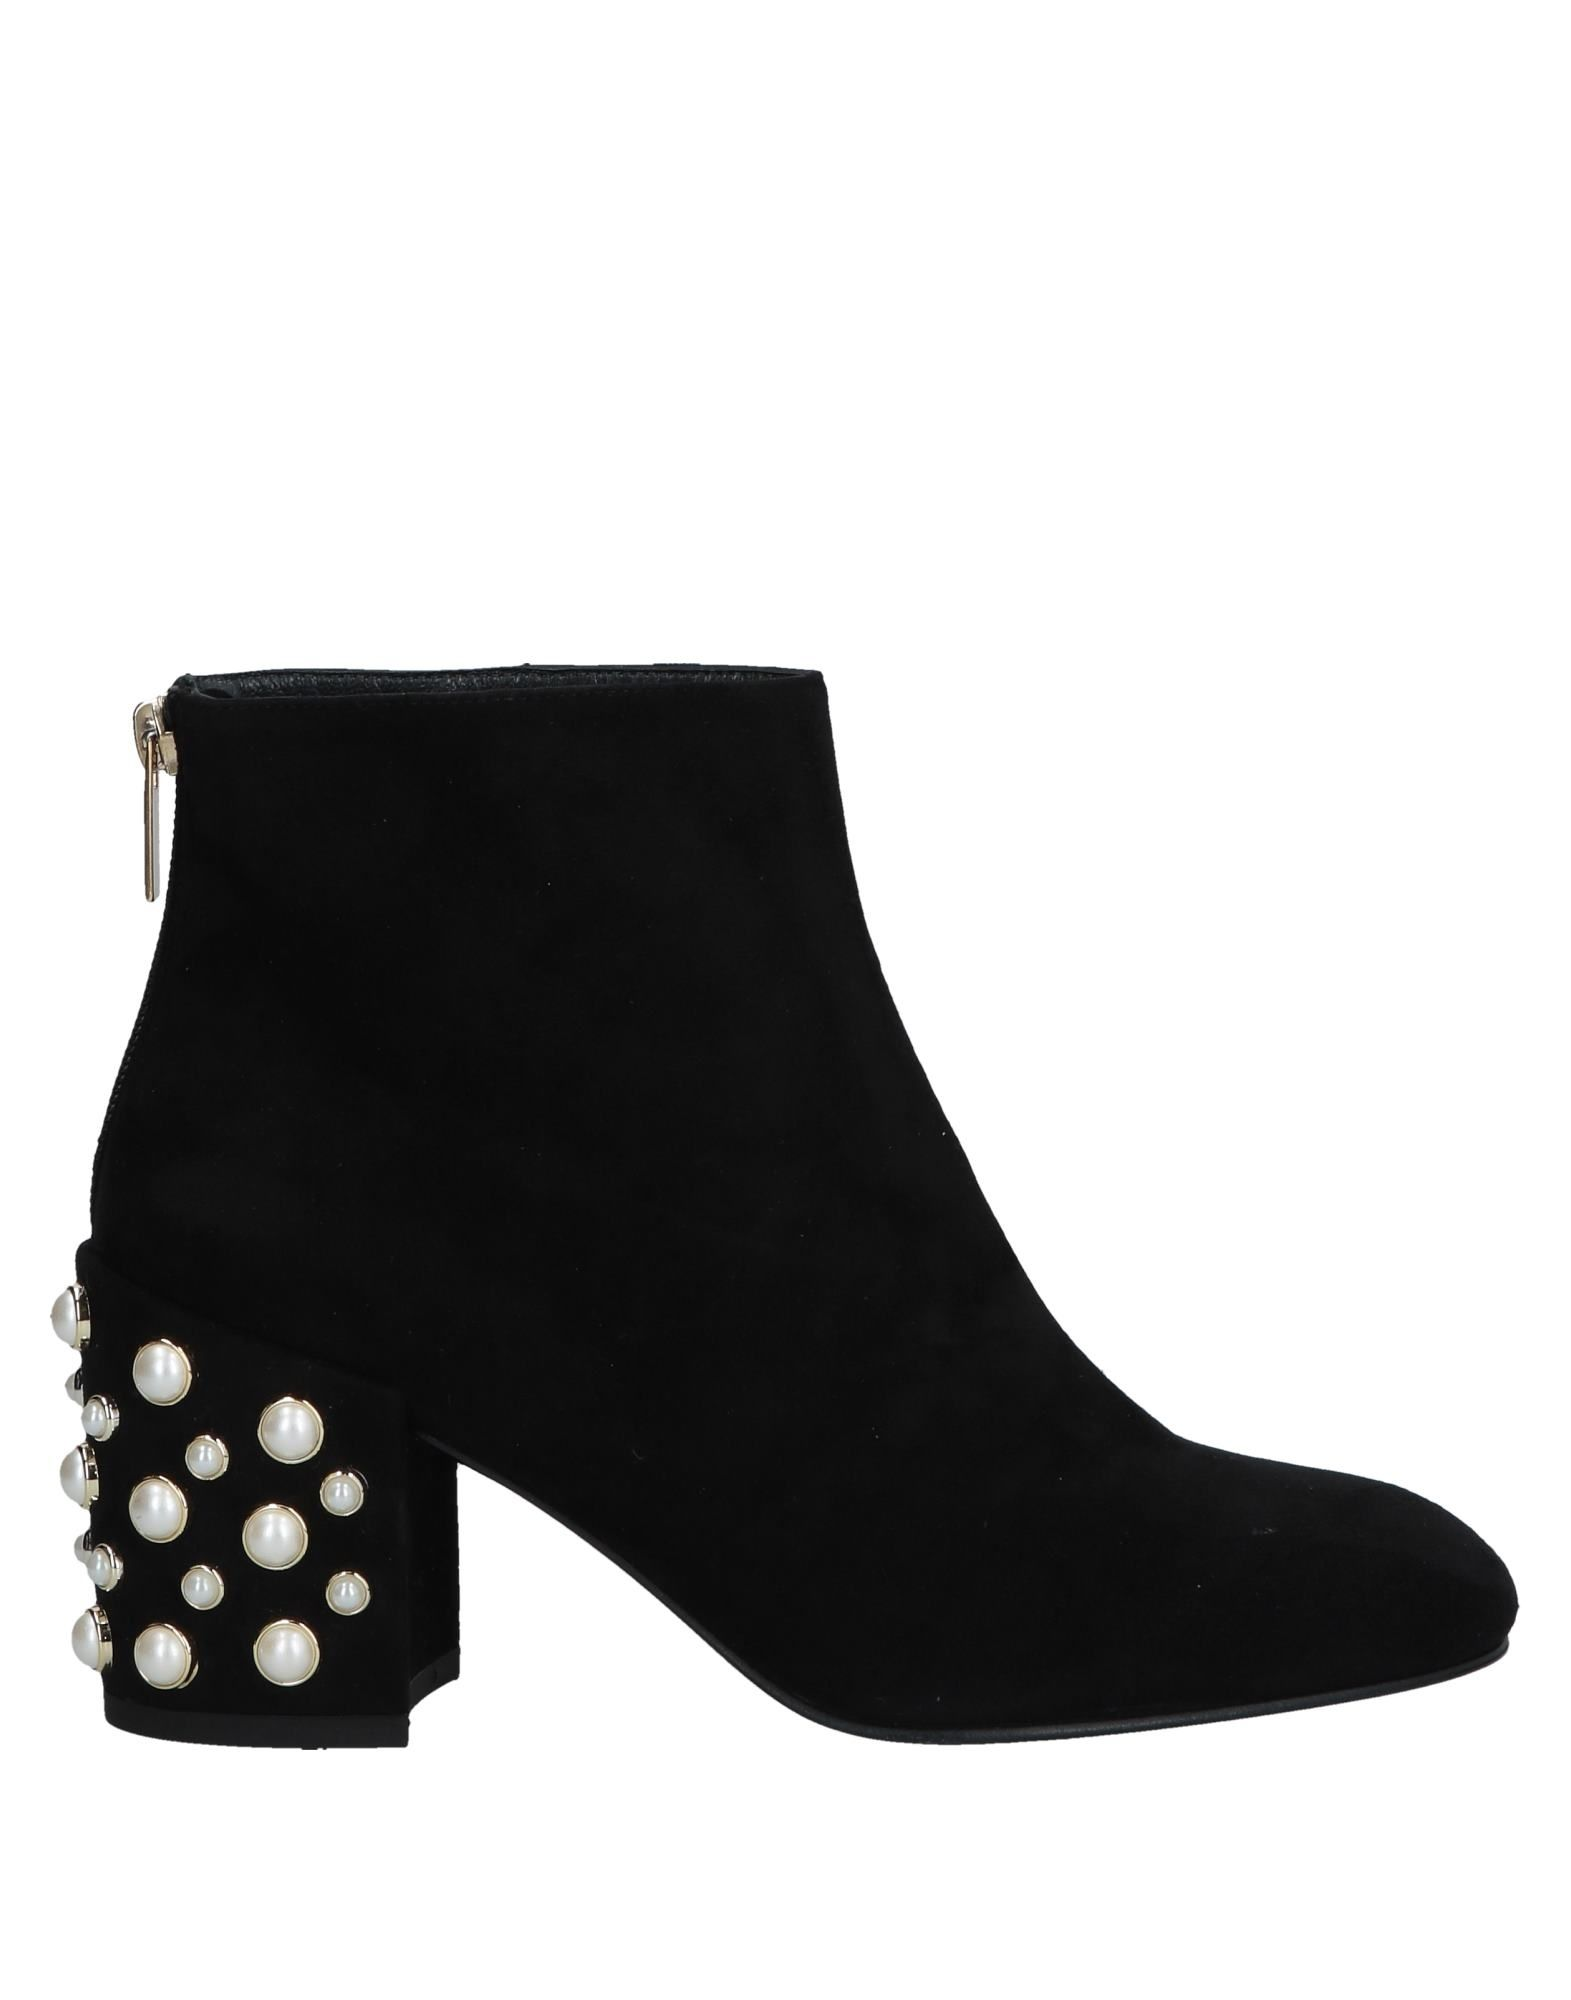 Stuart Weitzman Ankle Boot - Women Stuart Weitzman Ankle Ankle Ankle Boots online on  United Kingdom - 11568182GC 54dc3e